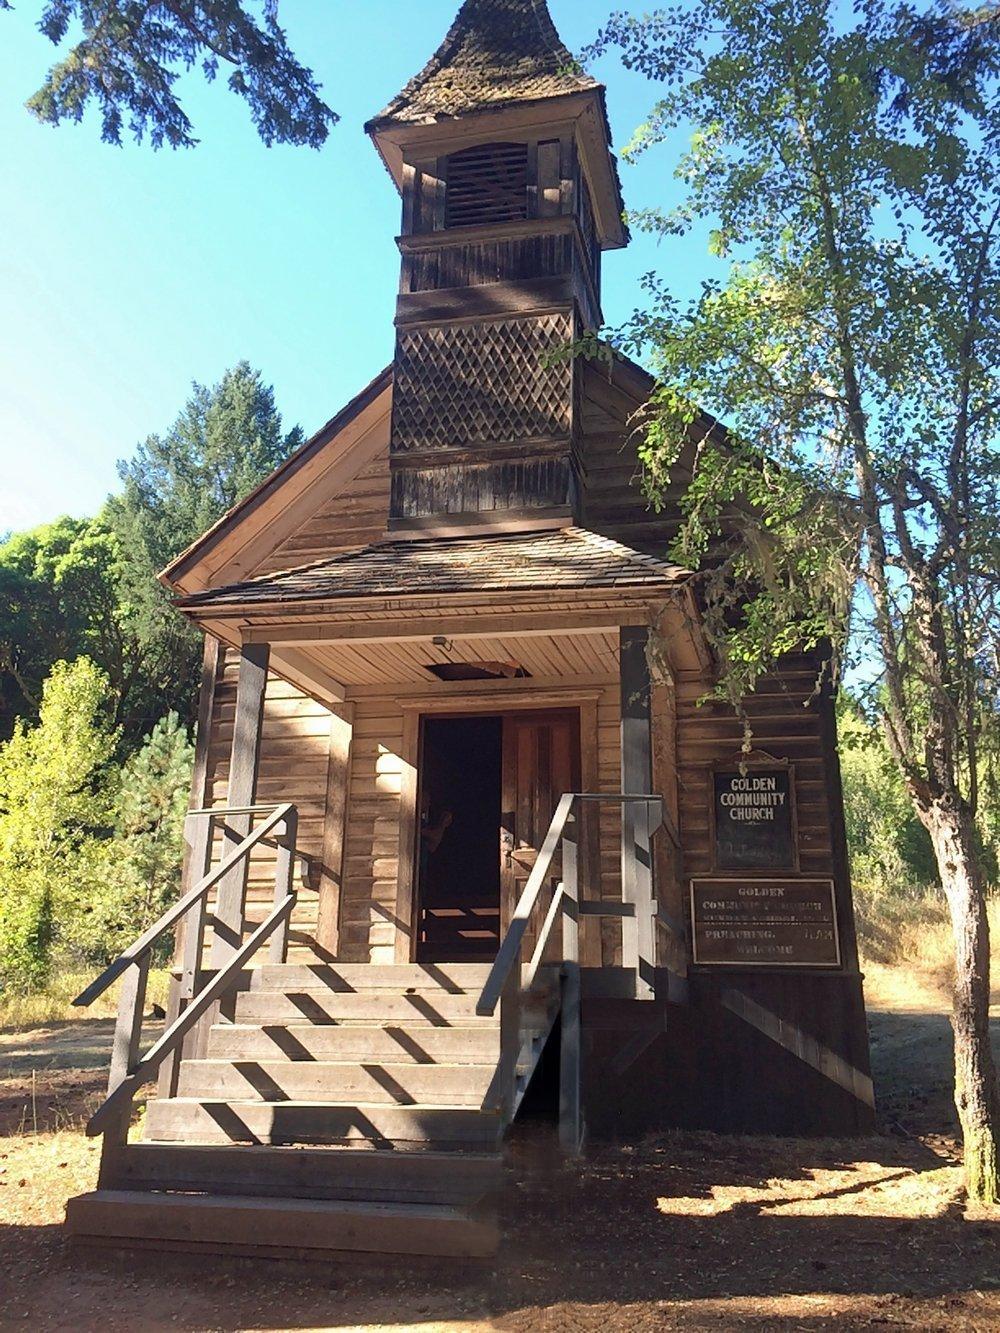 Church at Golden, Oregon